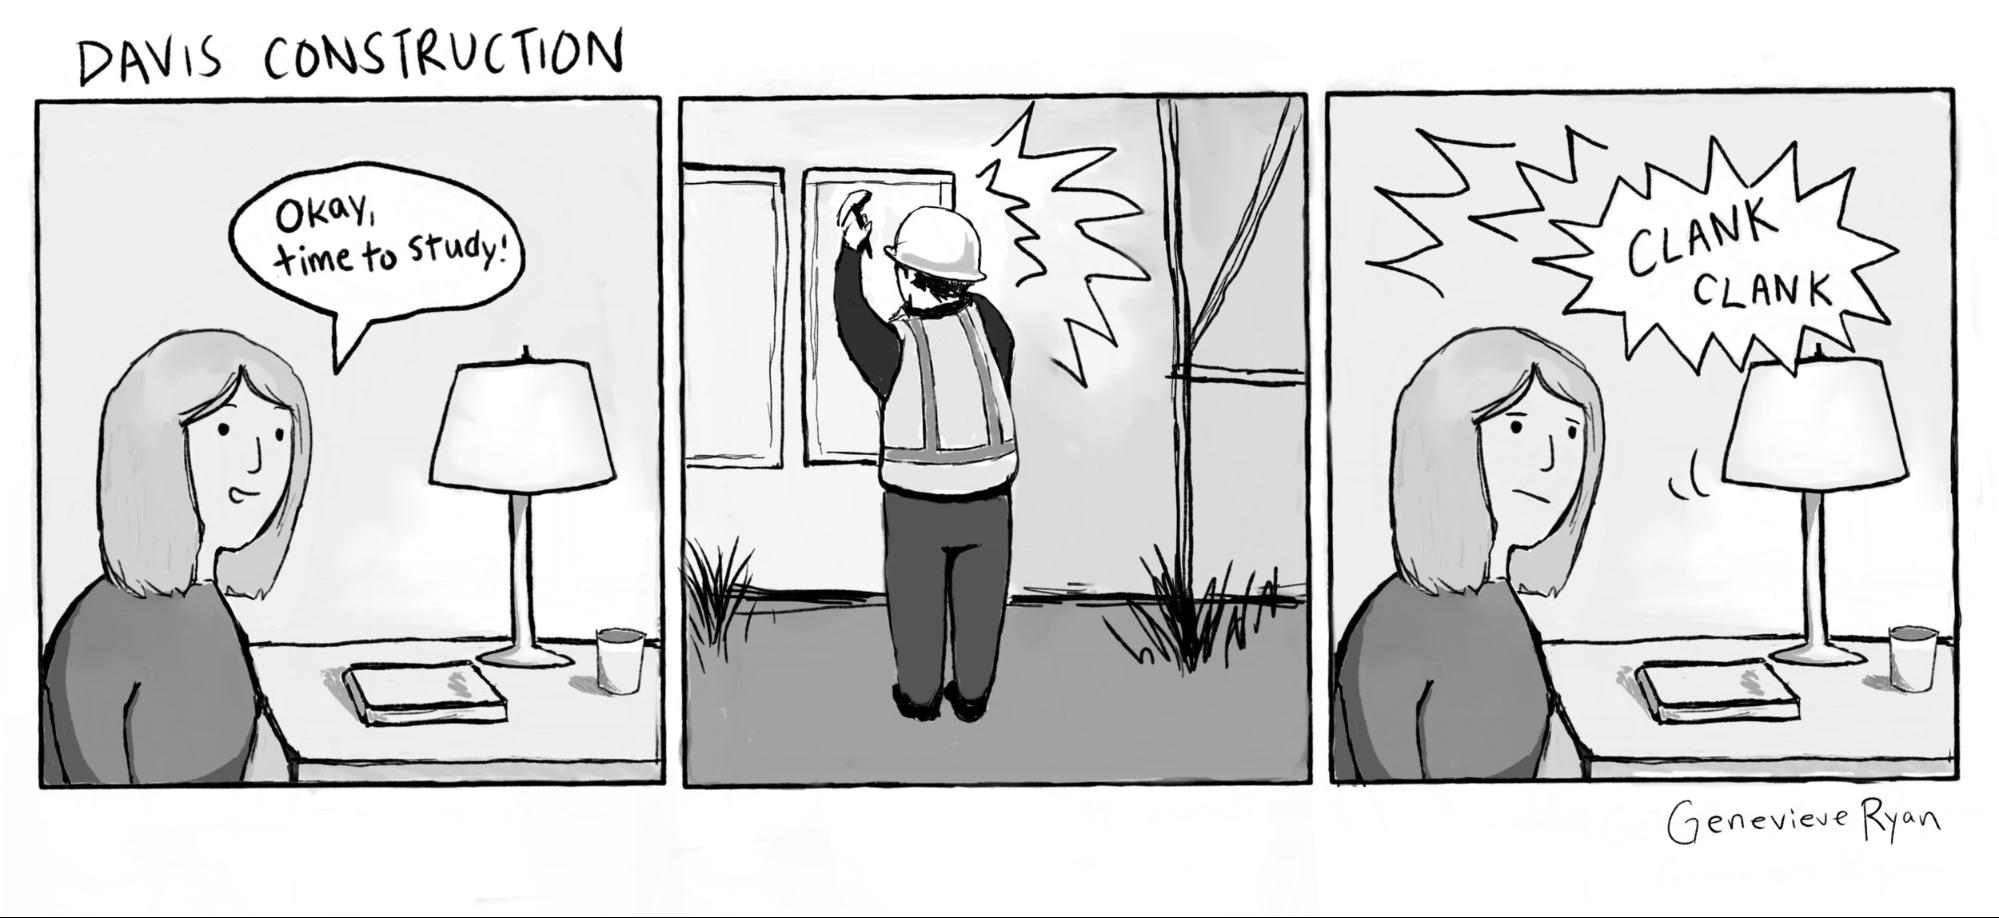 Cartoon: Davis Construction